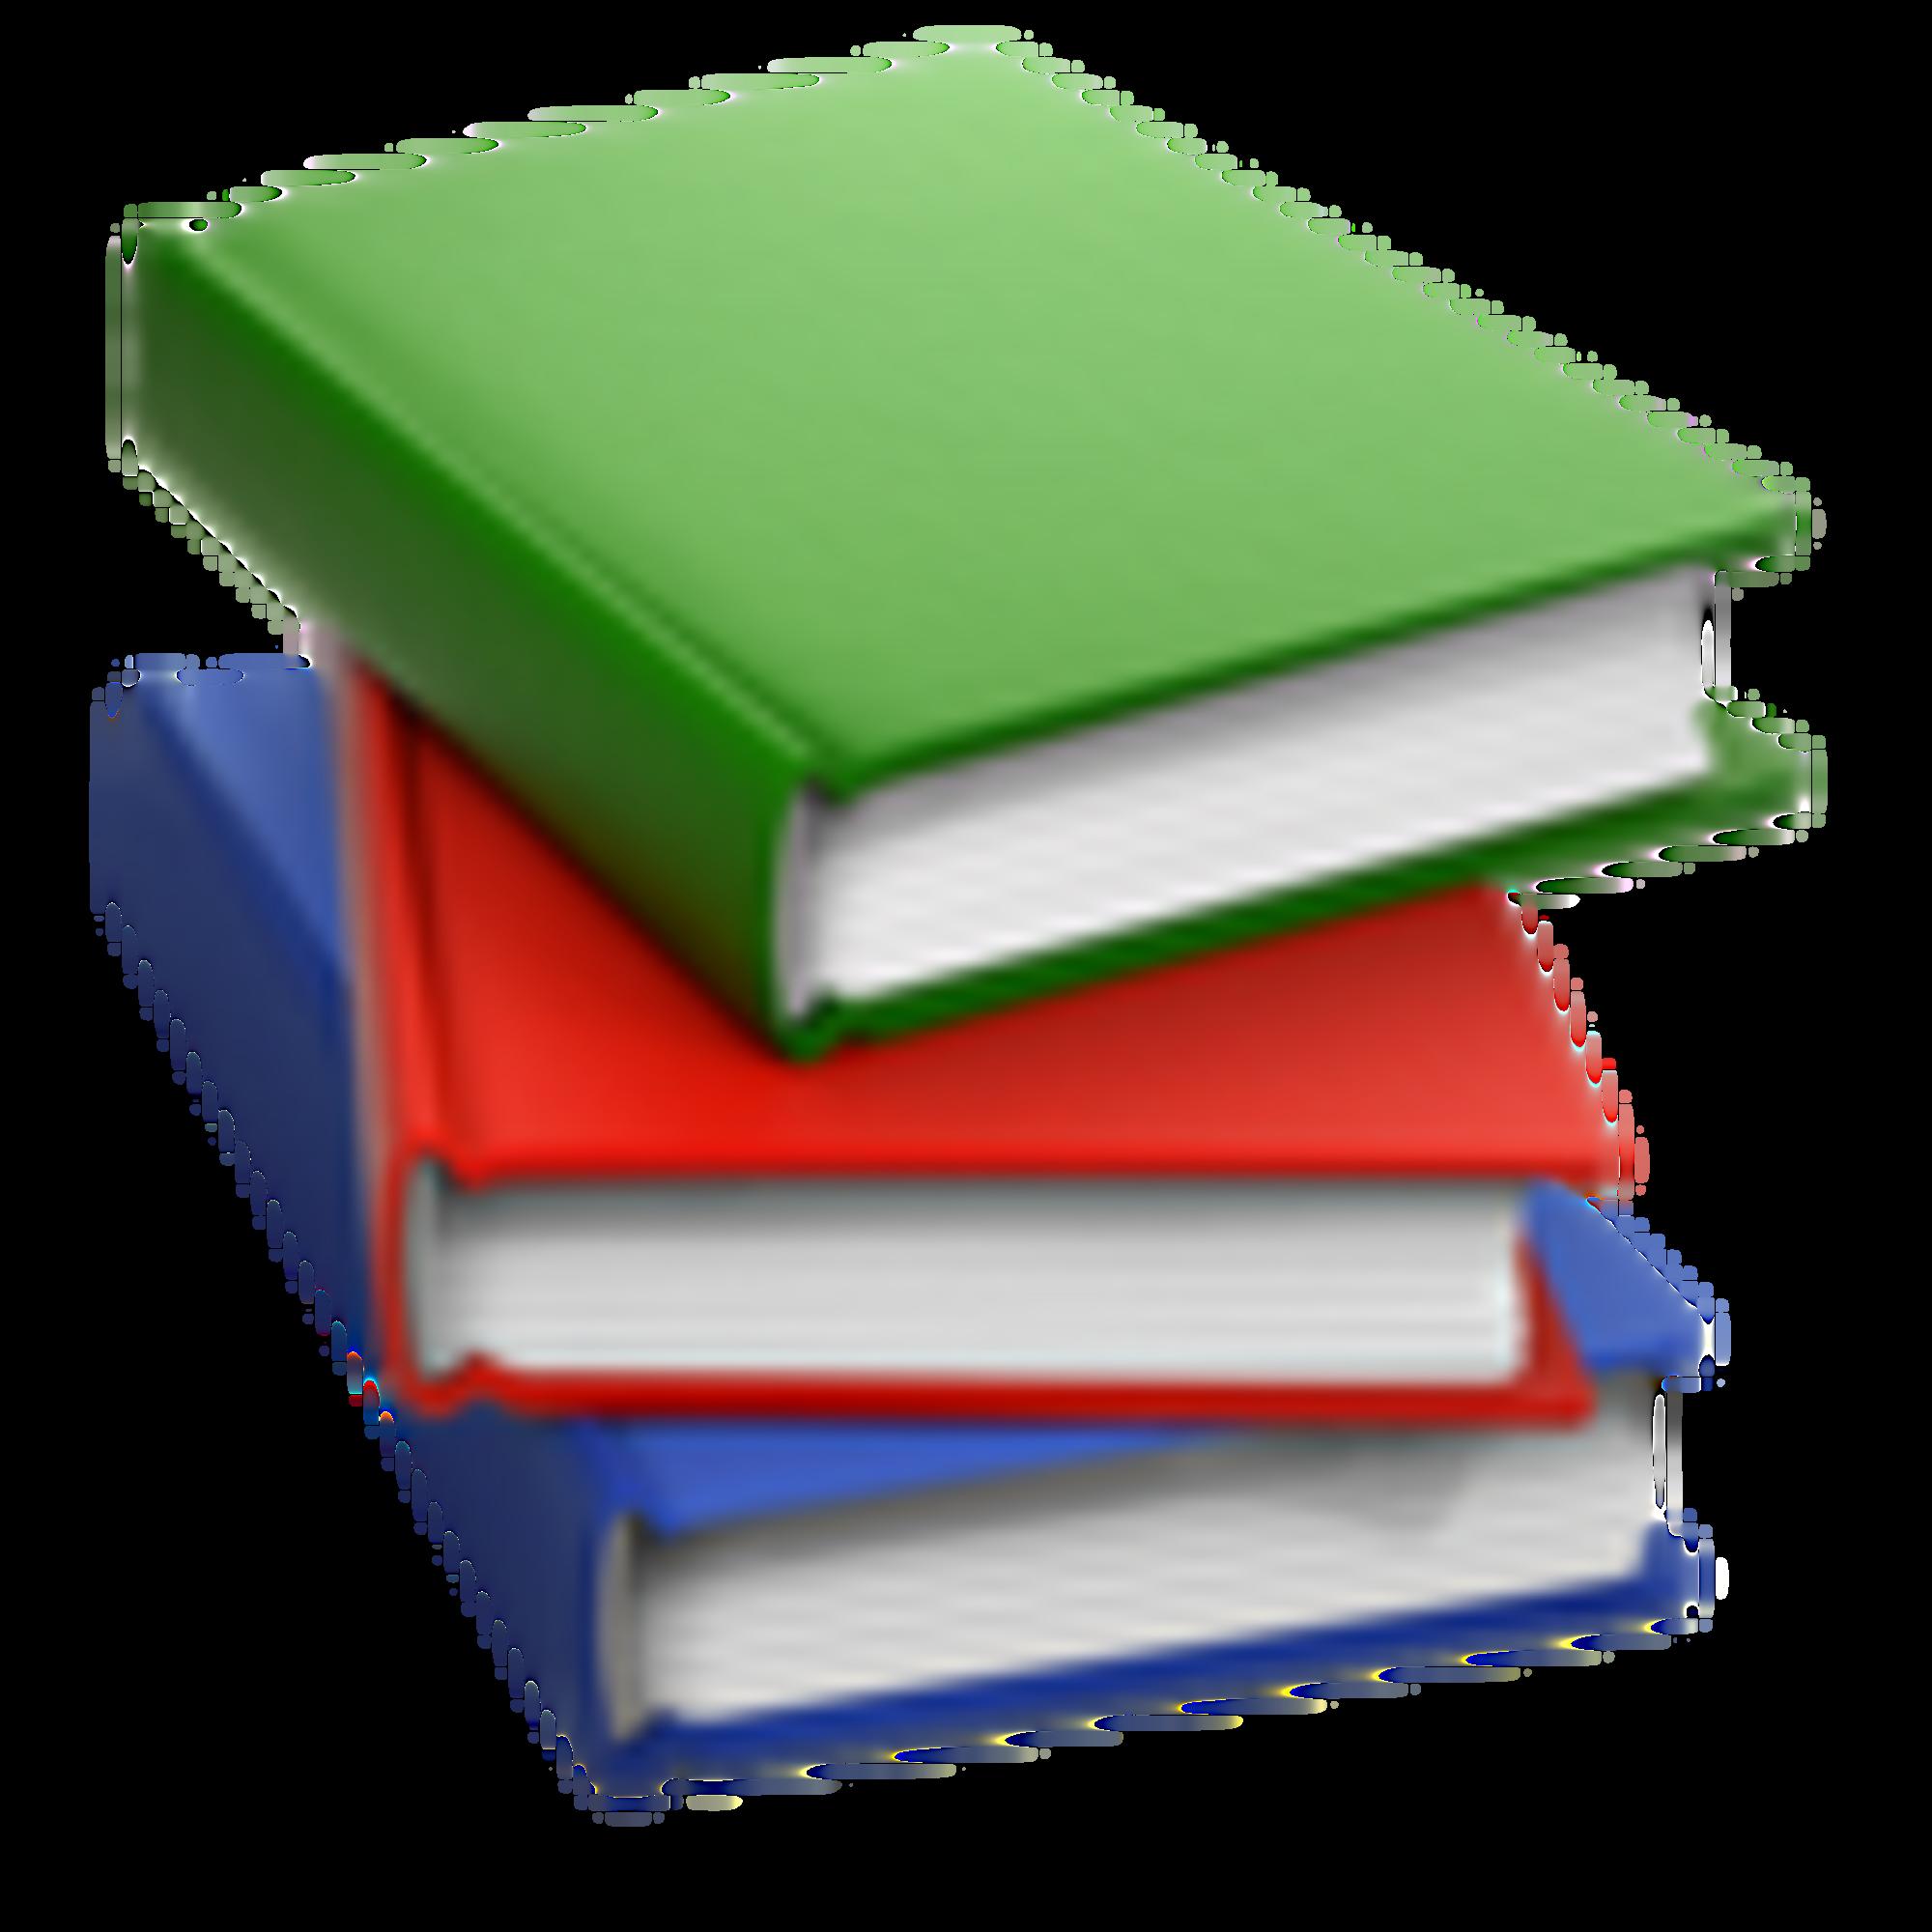 Book_Emoji.png